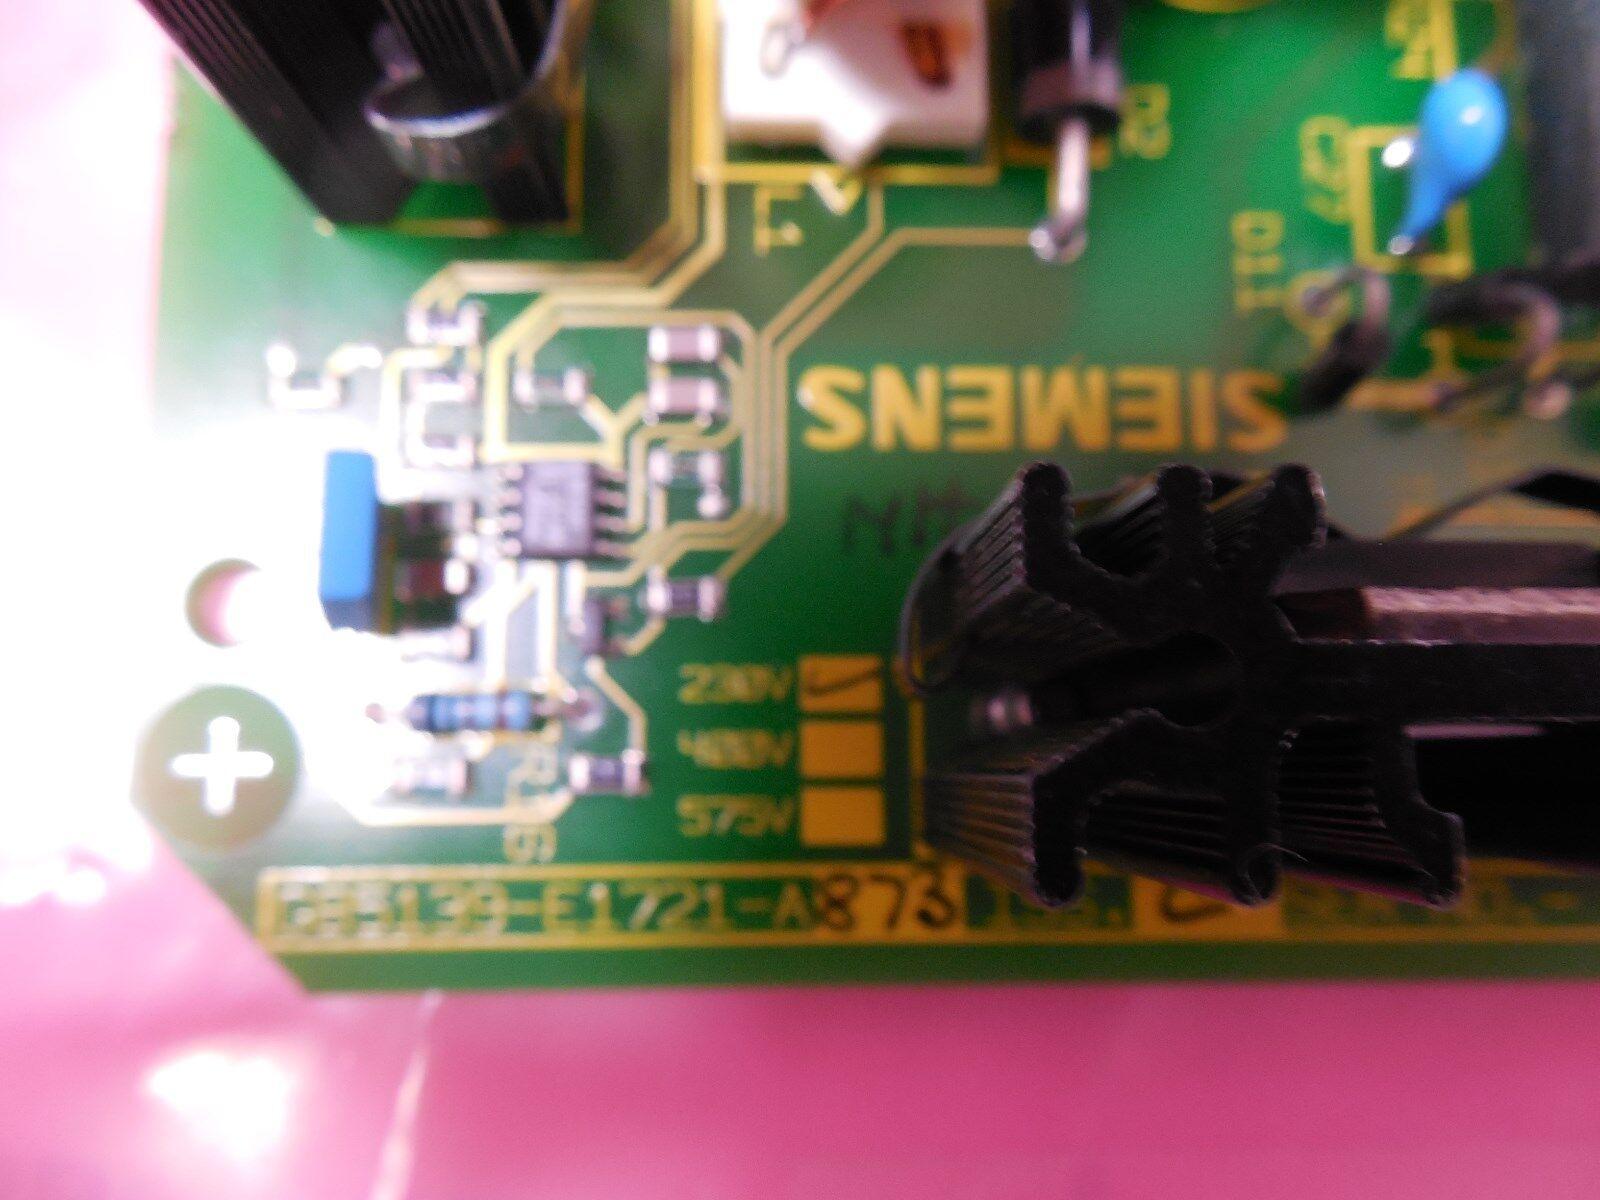 Siemens 6SC6170-0FC51 462 017.9052.51 E F G Power Supply Drive Board